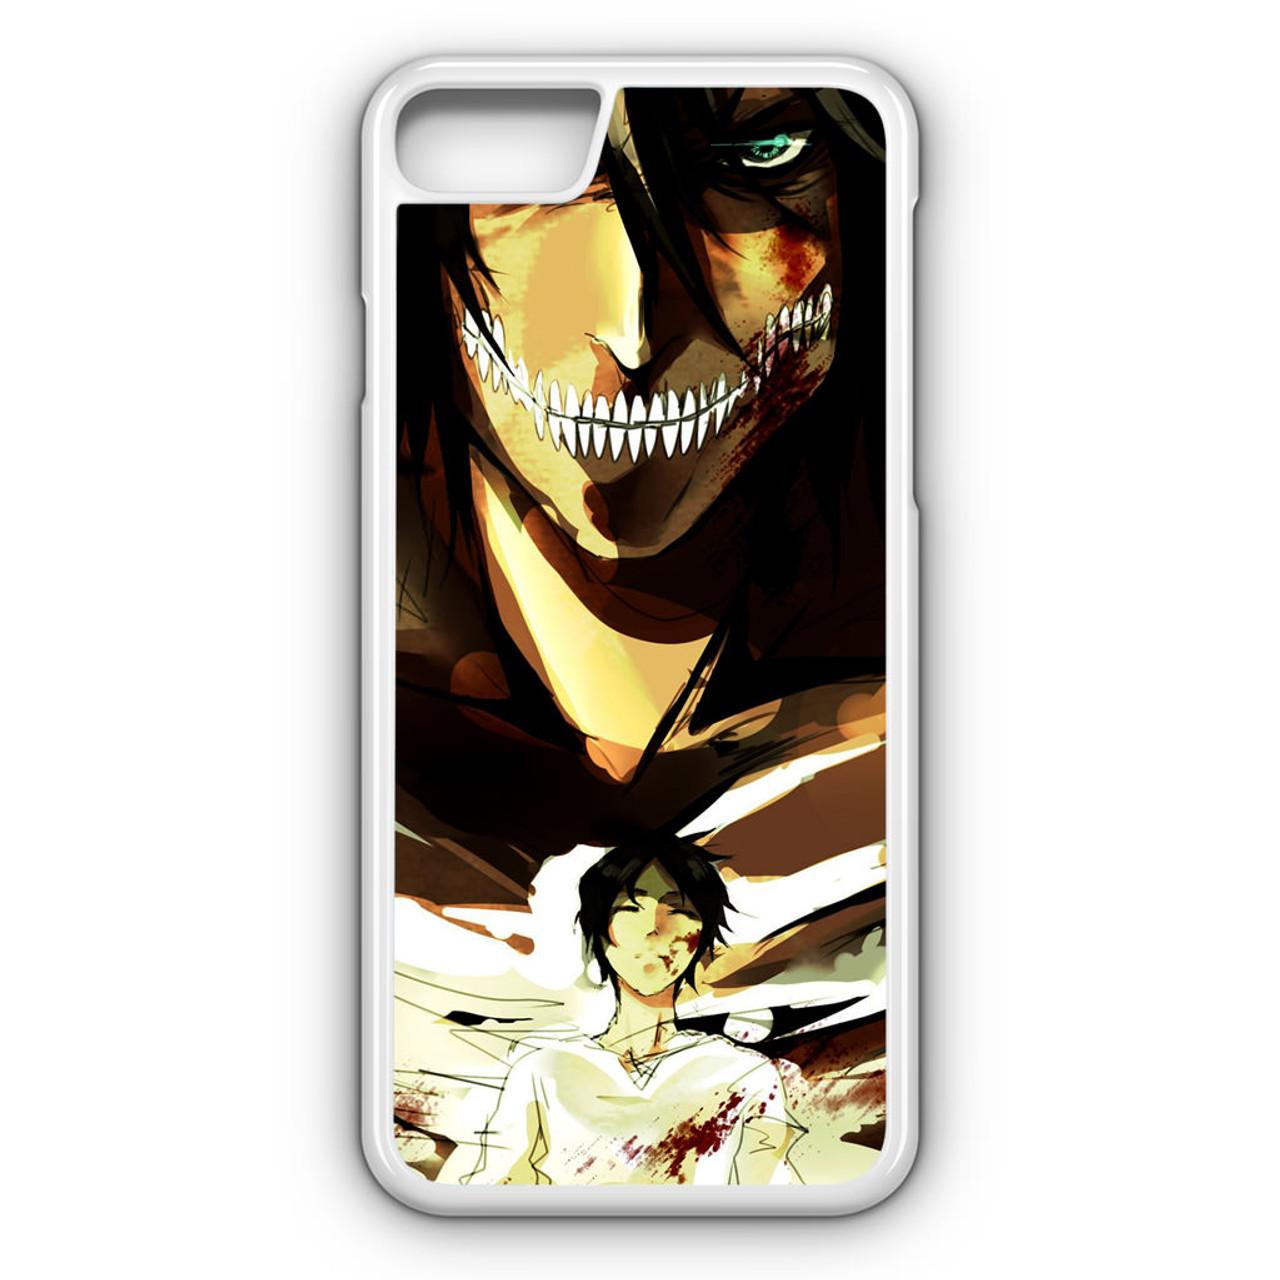 Anime Attack On Titan Scout Regiment Eren Jaeger iphone case